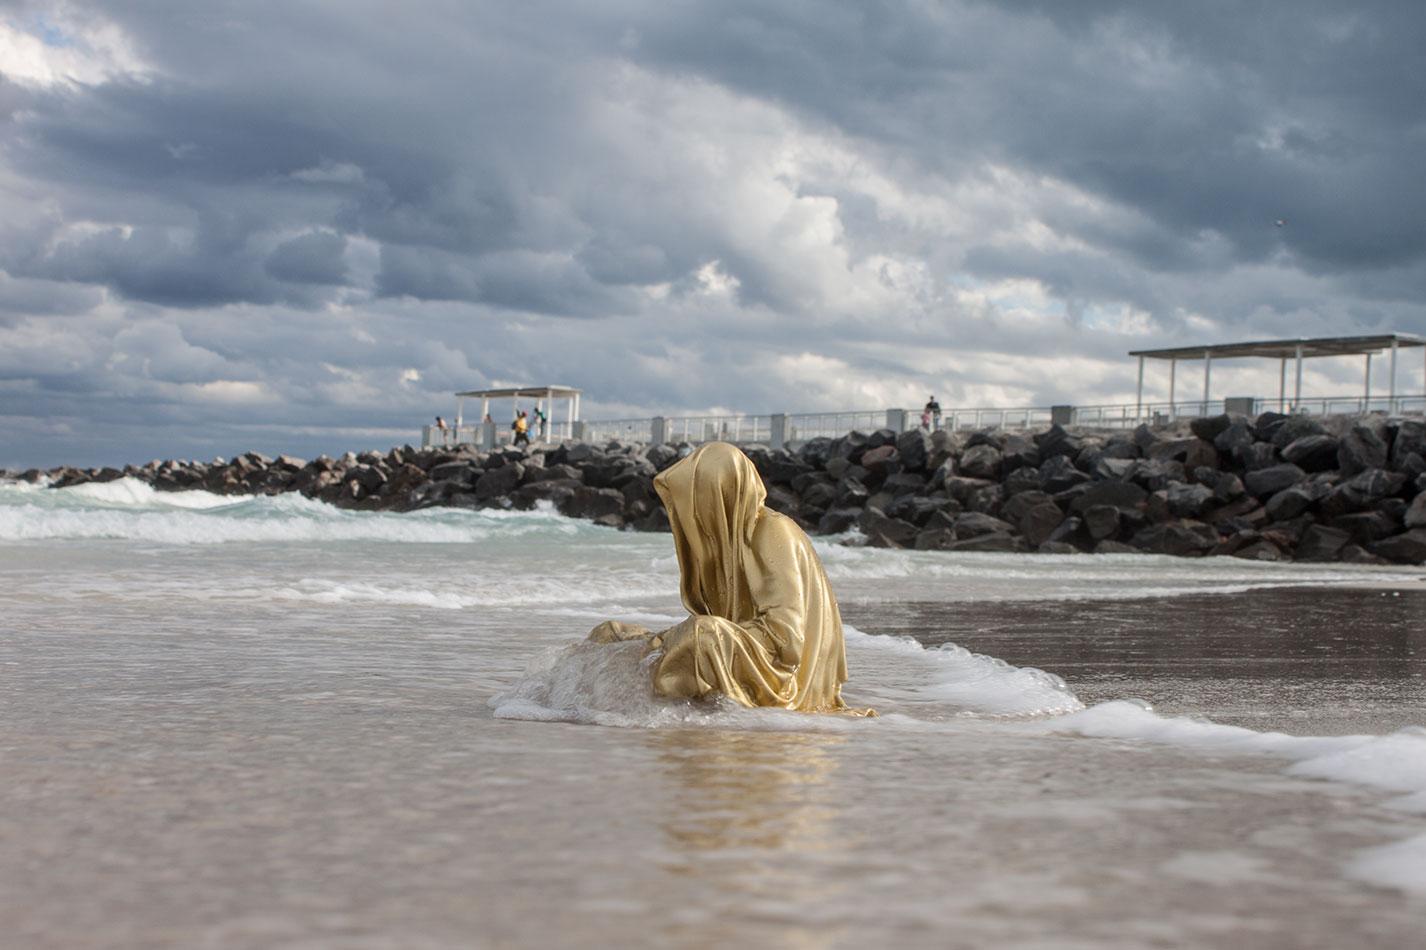 public-art-basel-miami-beach-fair-usa-florida-guardians-of-time-manfred-kili-kielnhofer-contemporary-fine-art-modern-arts-design-antiques-sculpture-6857